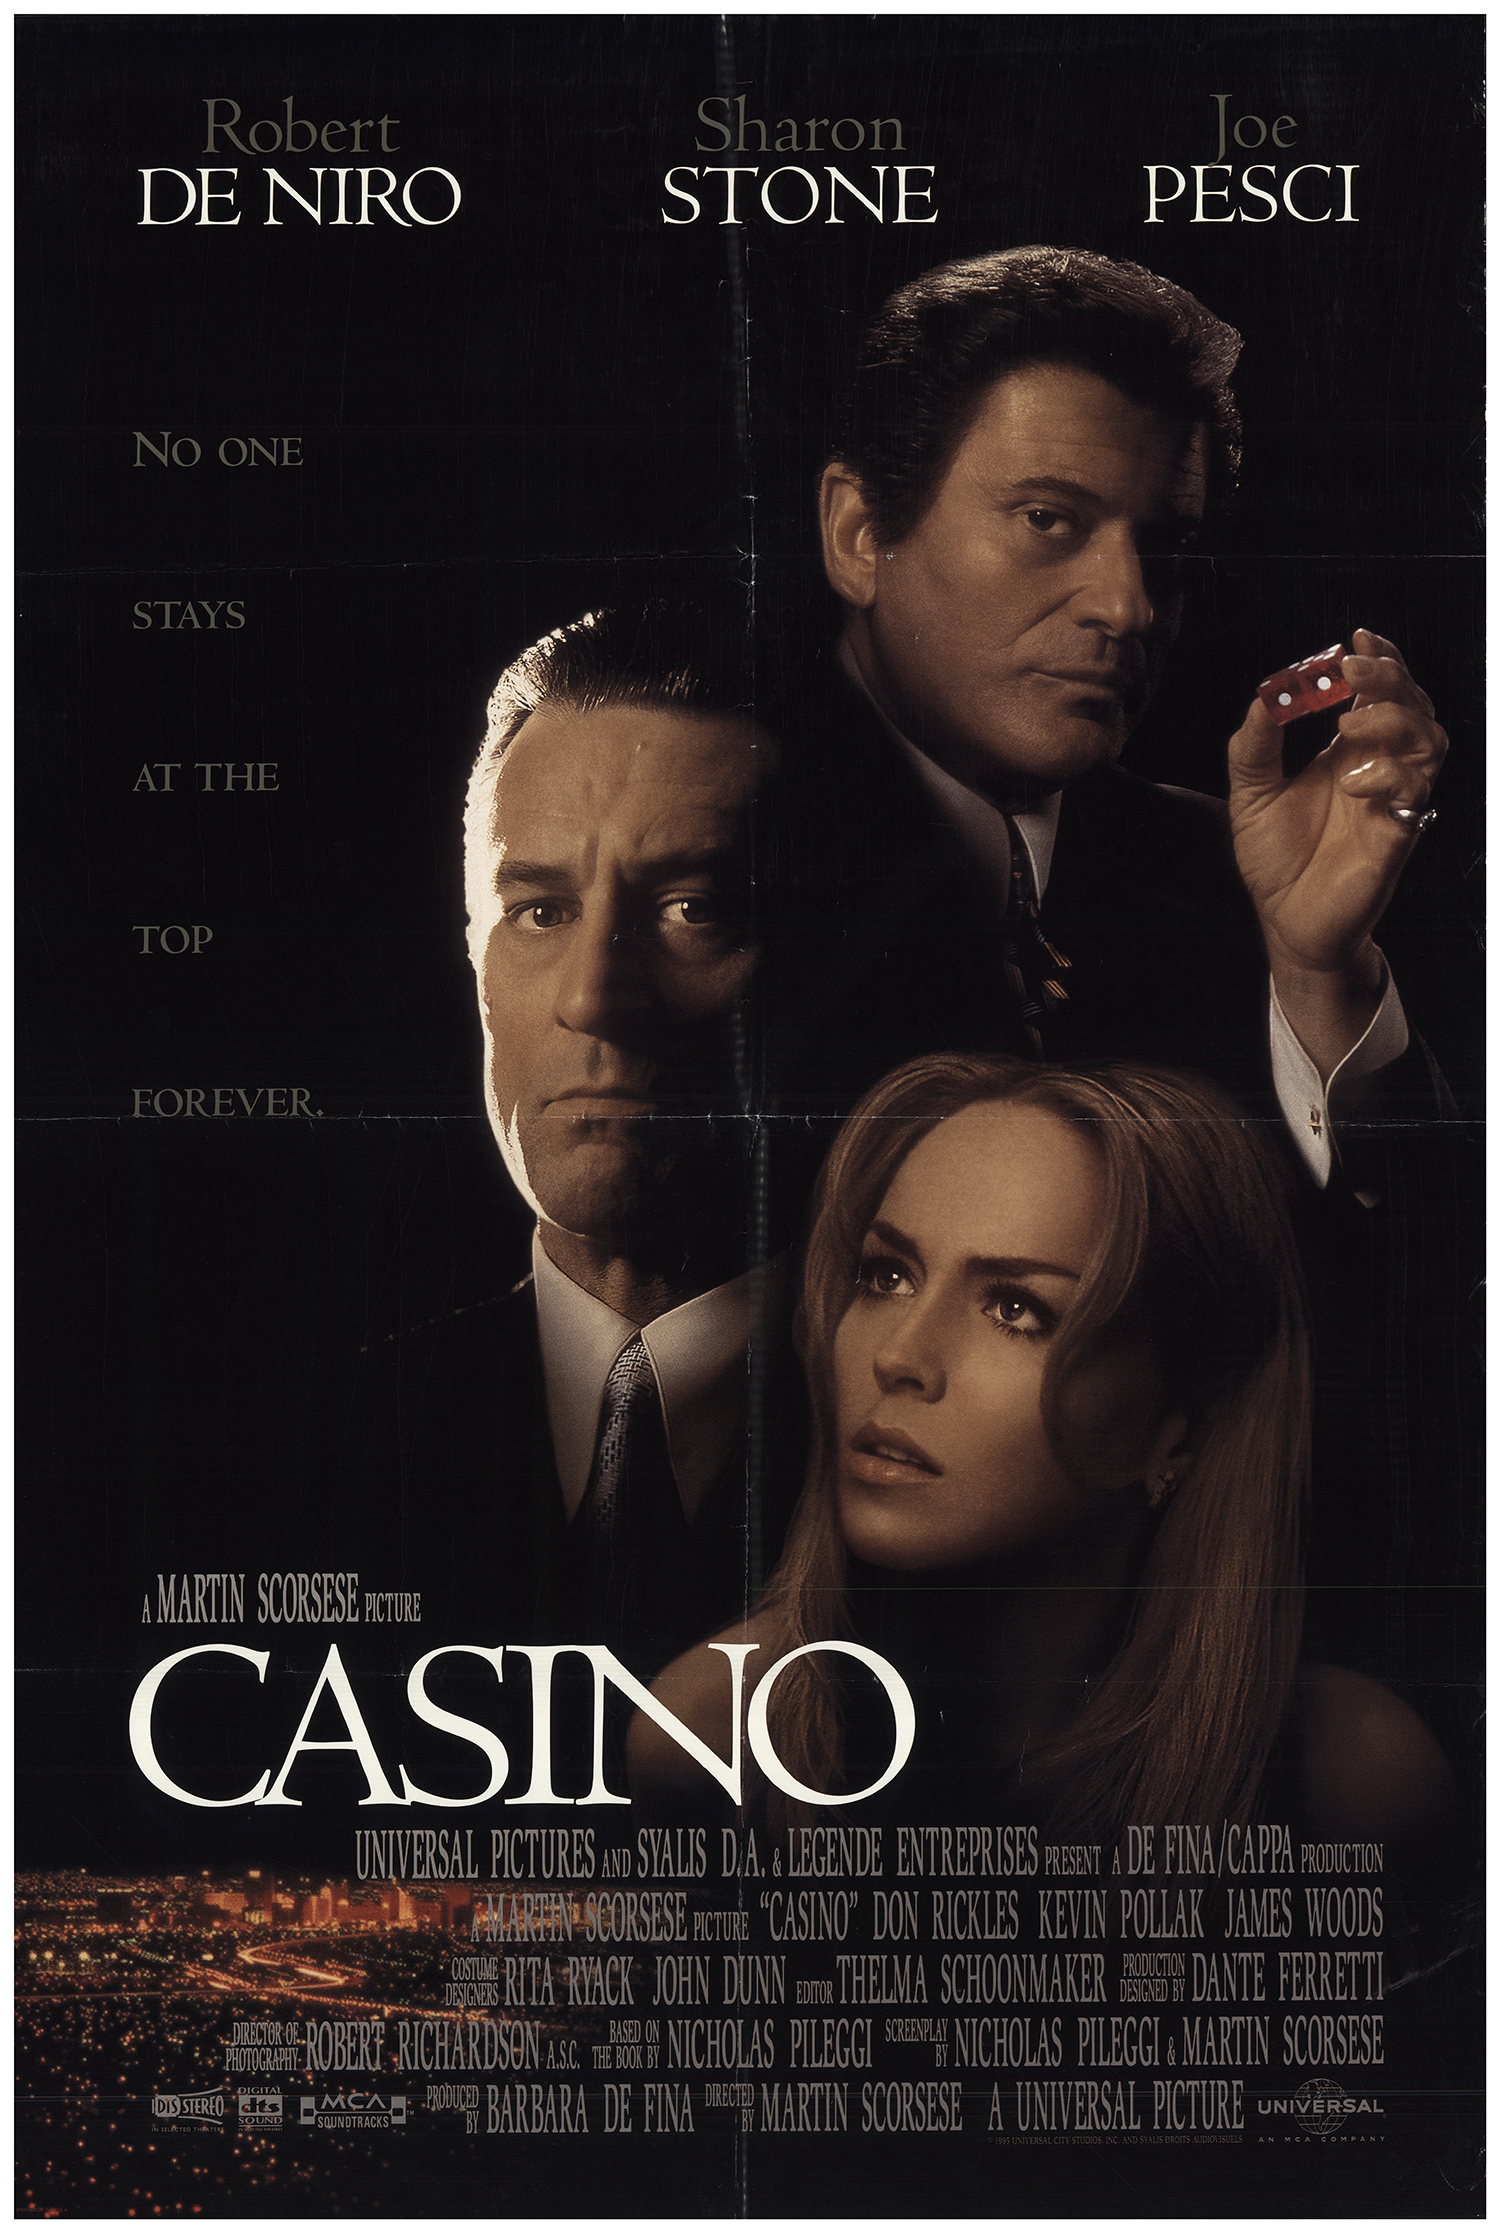 Casinomovie